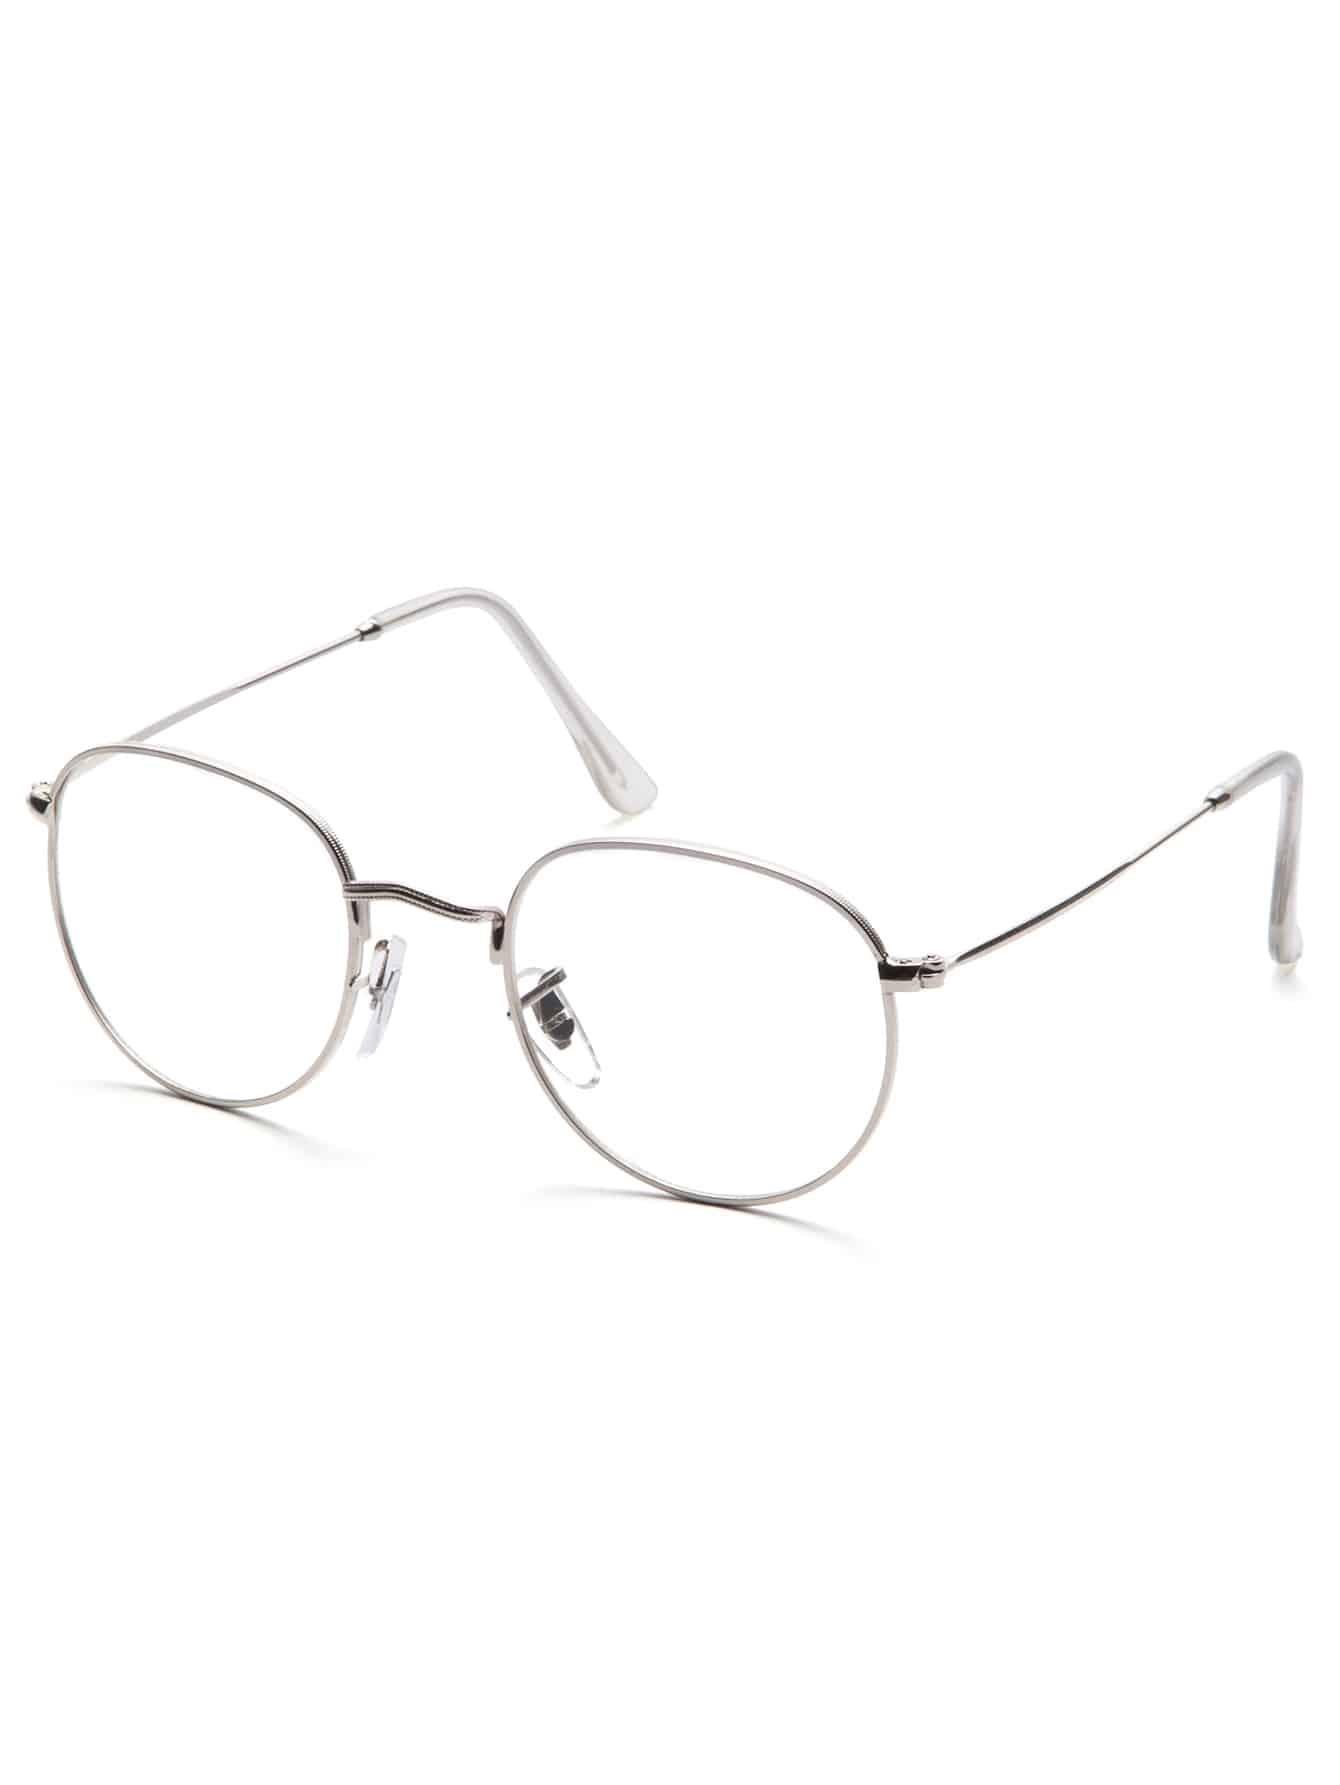 Silver Frame Clear Lens Glasses видеорегистратор erisson vr gf104